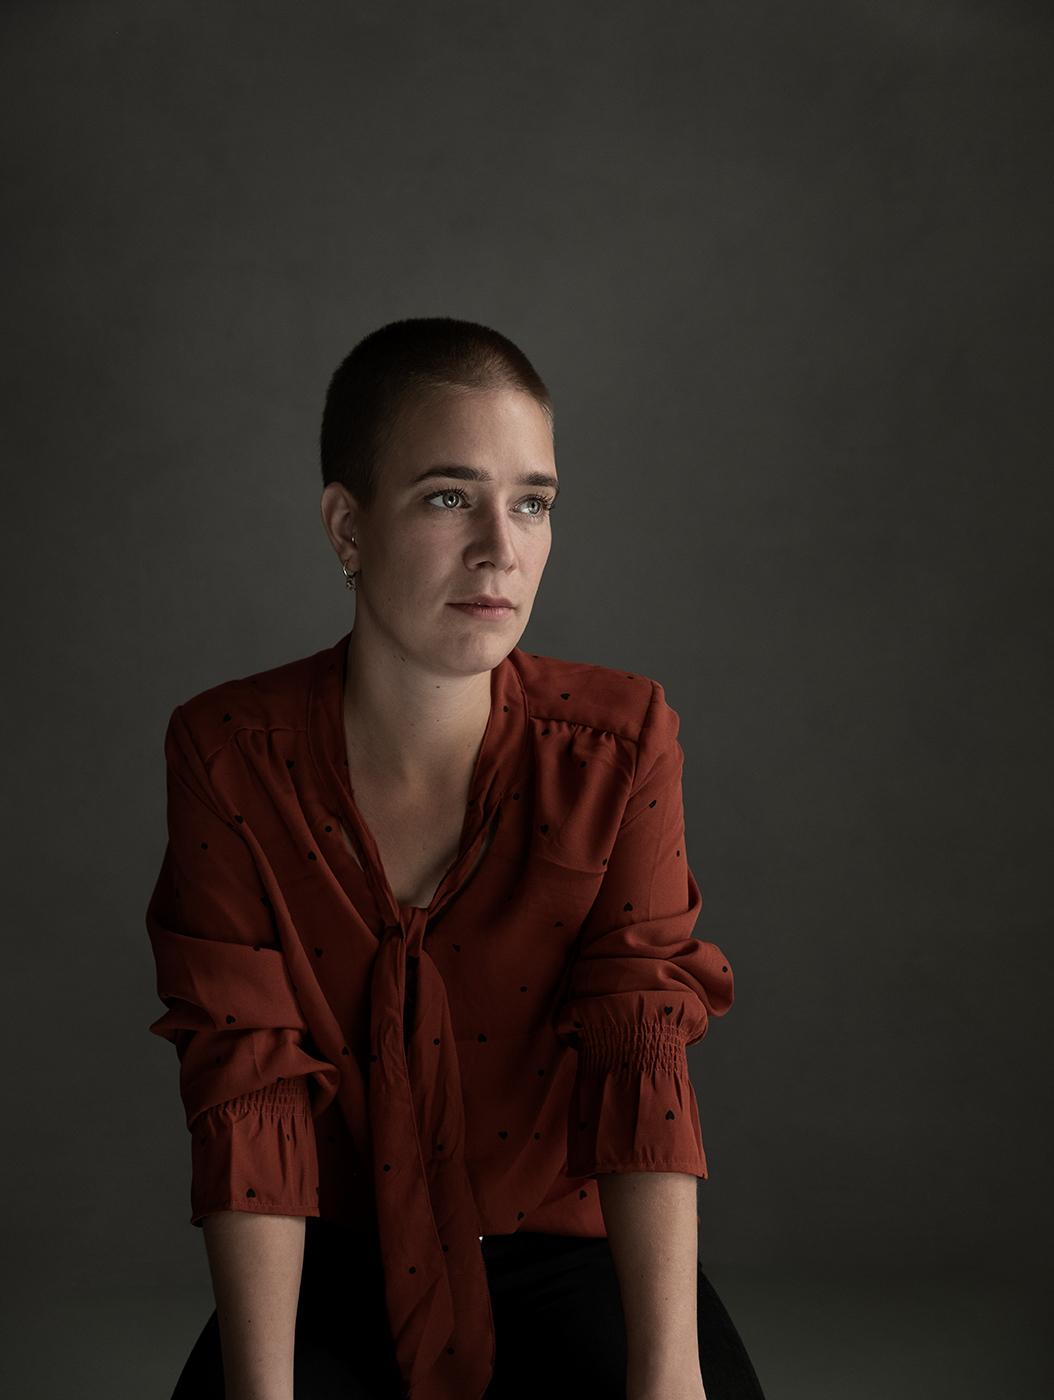 Susanne Middelberg, actress, actrice, portrait, portret, portraitphotography, portretfotografie, daglicht, daylight